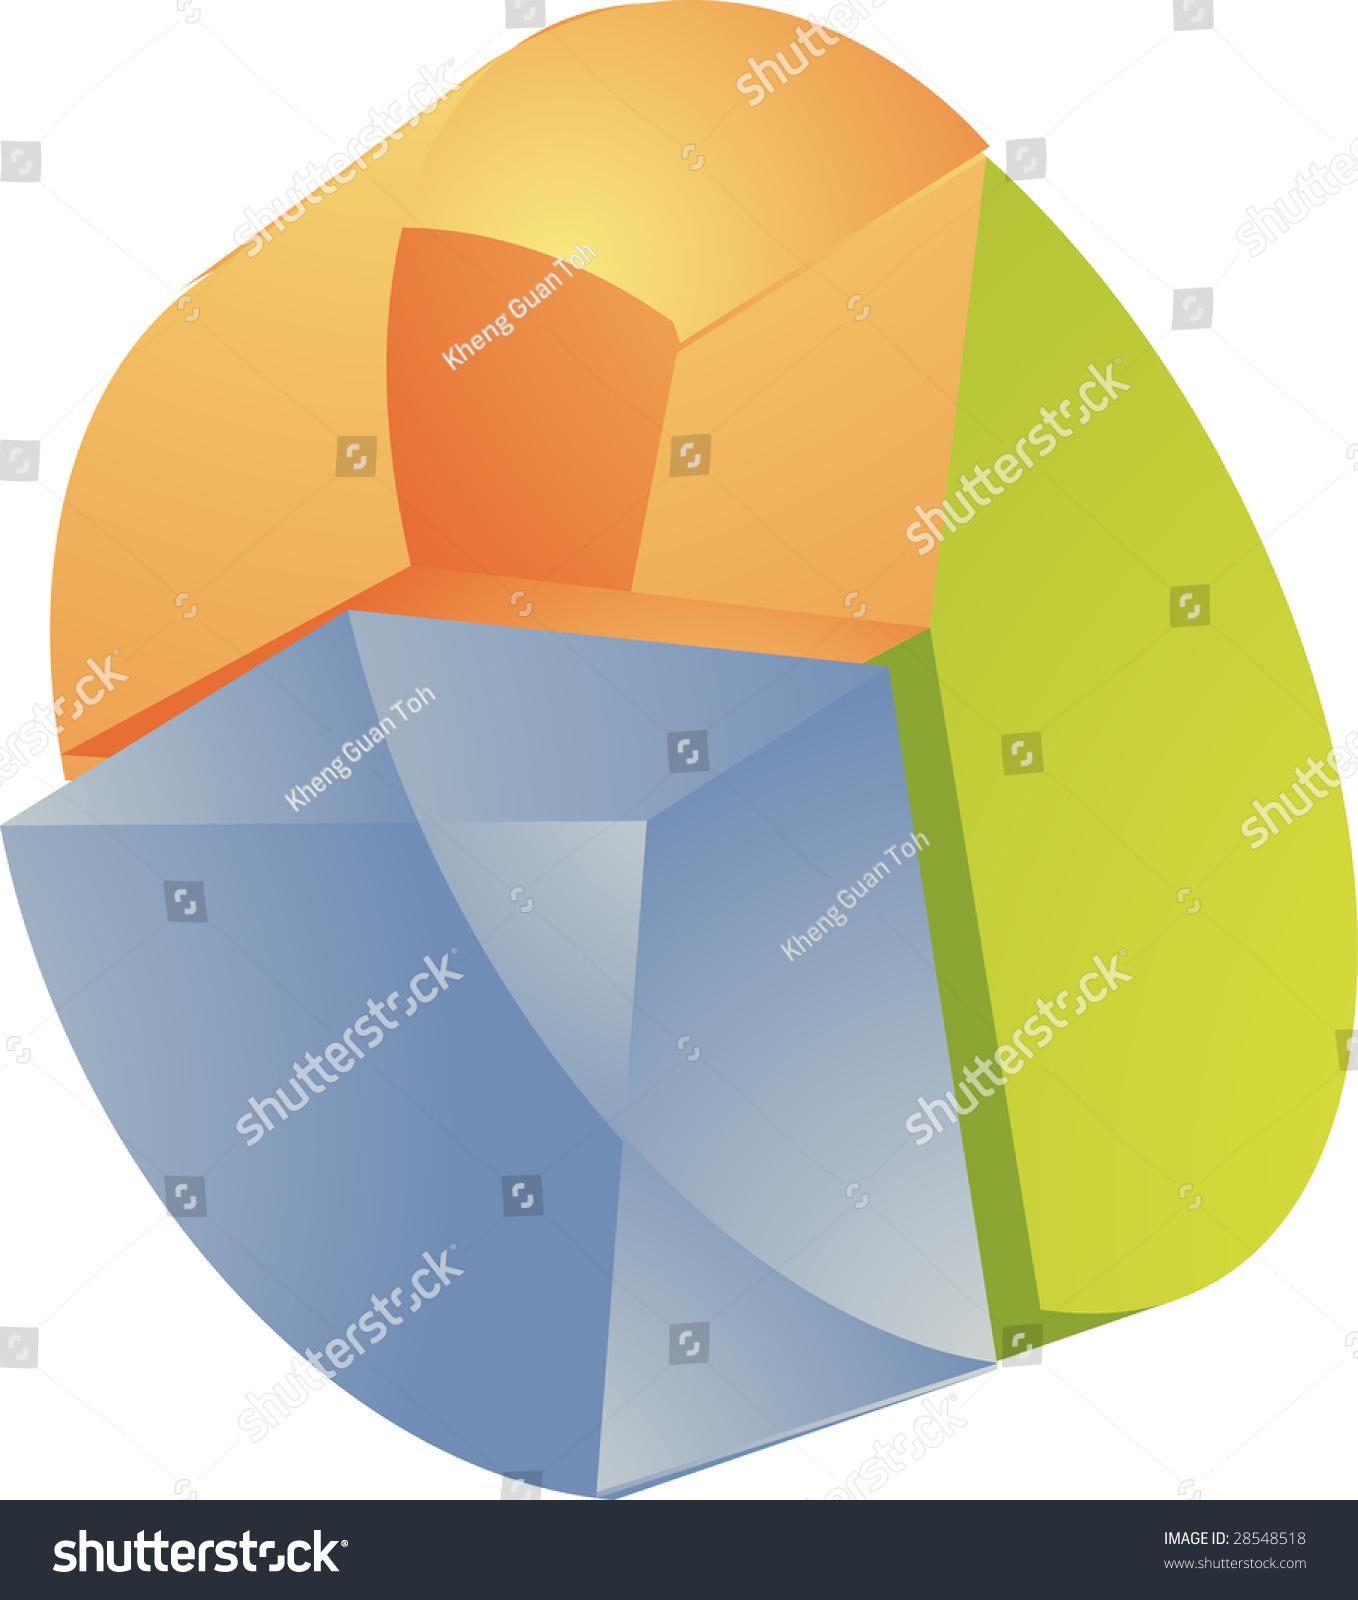 Financial illustration pie chart translucent effect stock financial illustration of pie chart translucent effect nvjuhfo Images